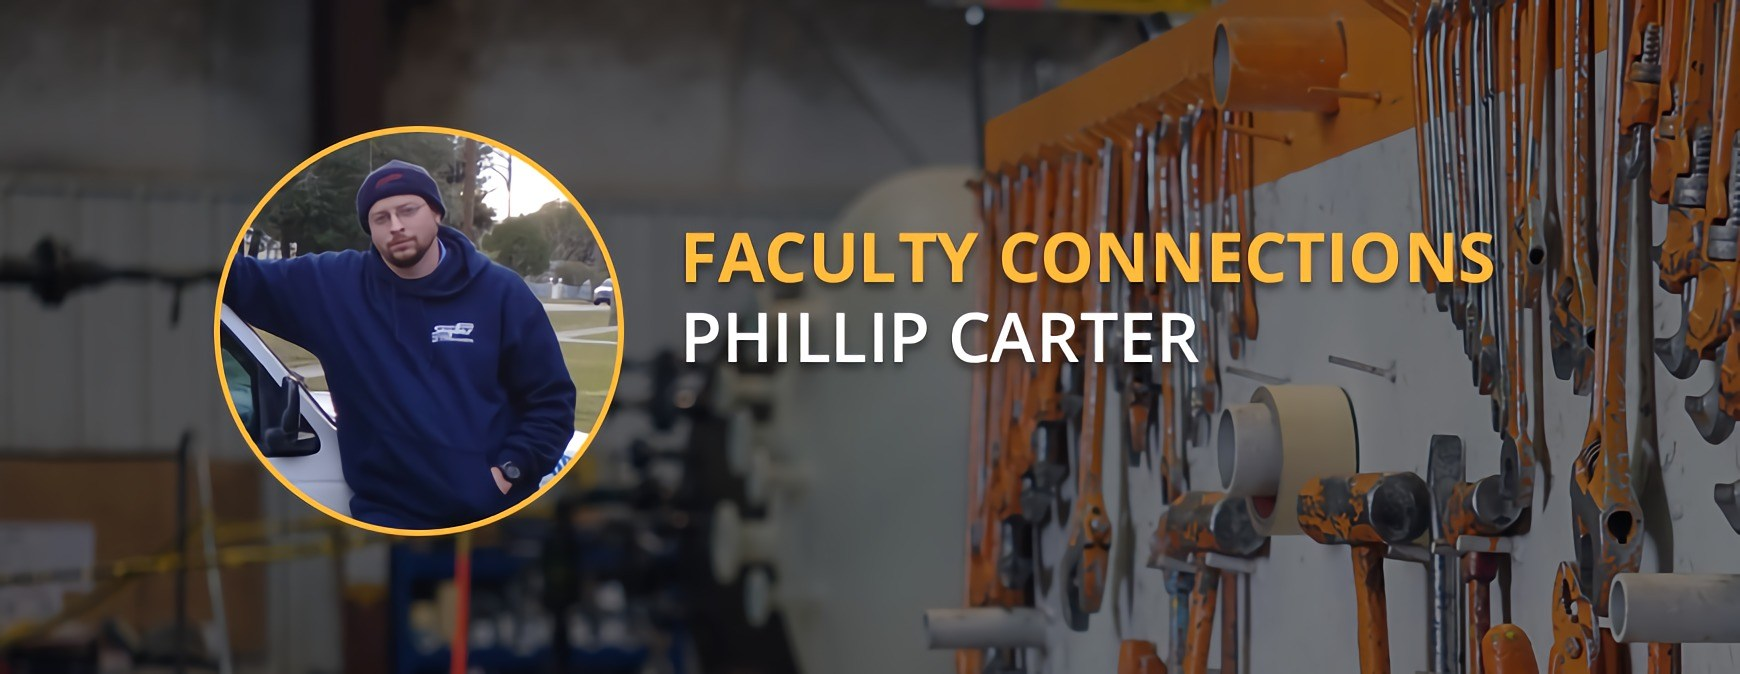 Phillip Carter